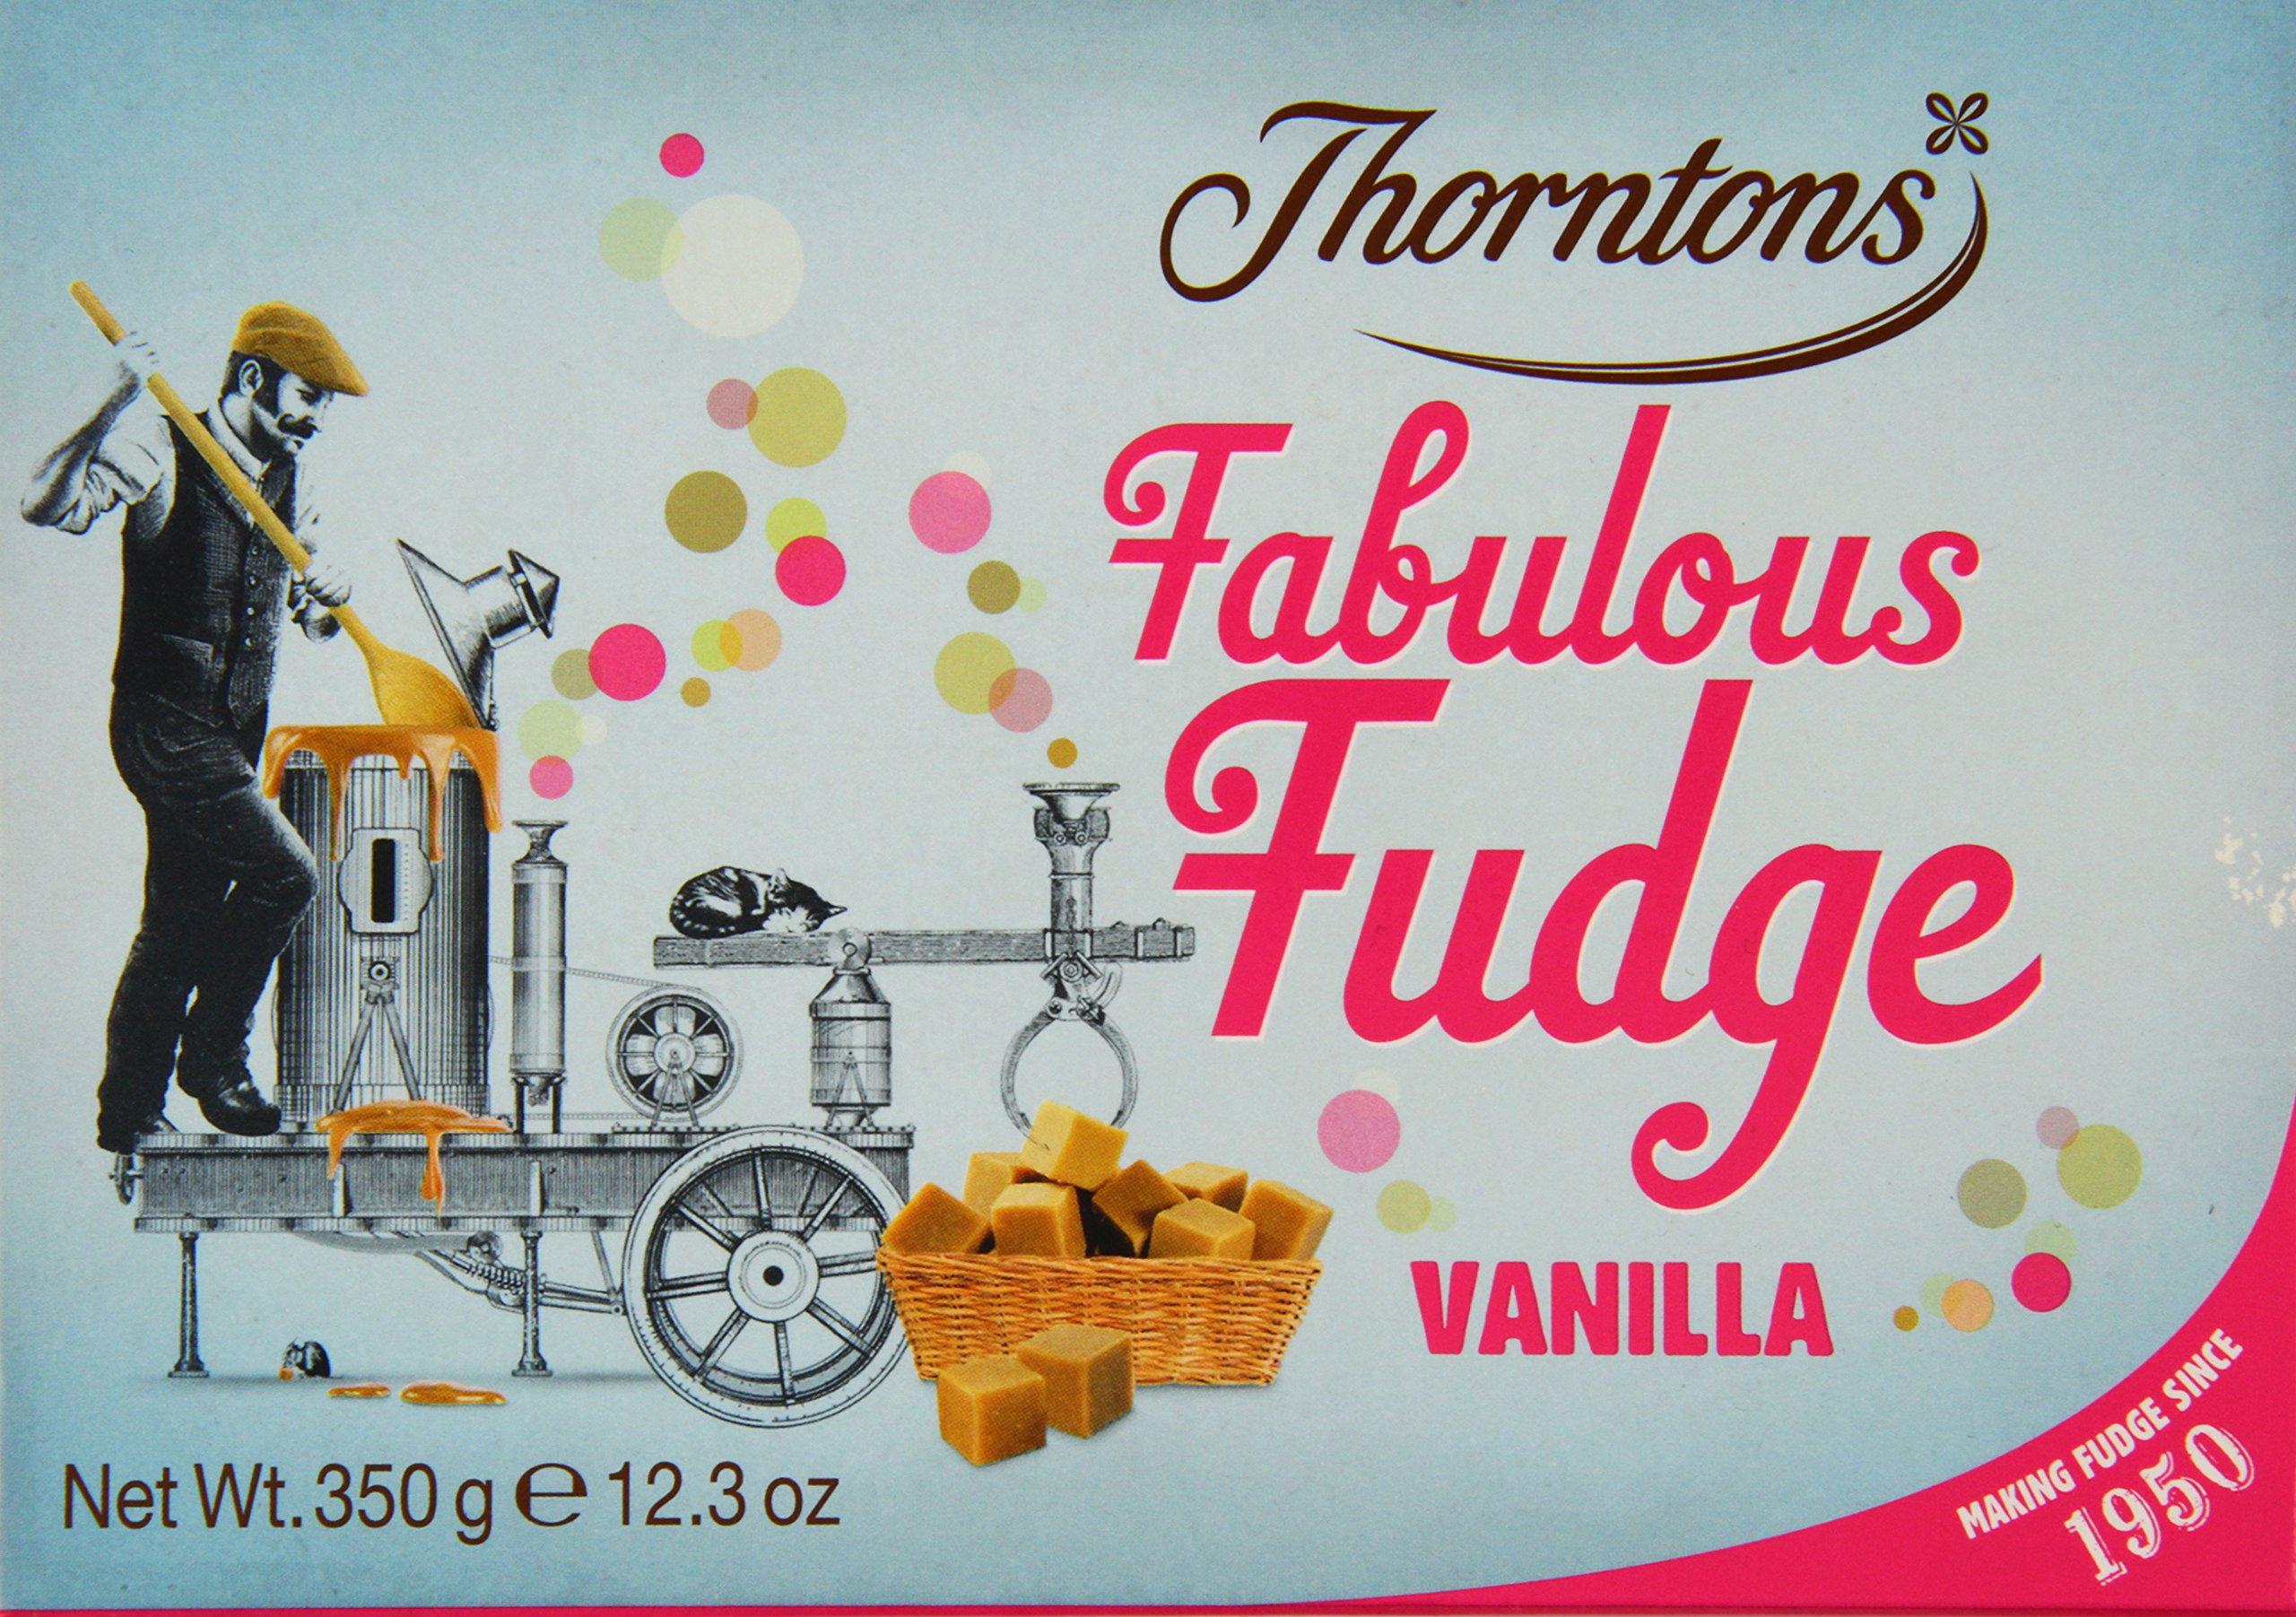 Thorntons Fabulous Fudge Vanilla 350g by Thorntons